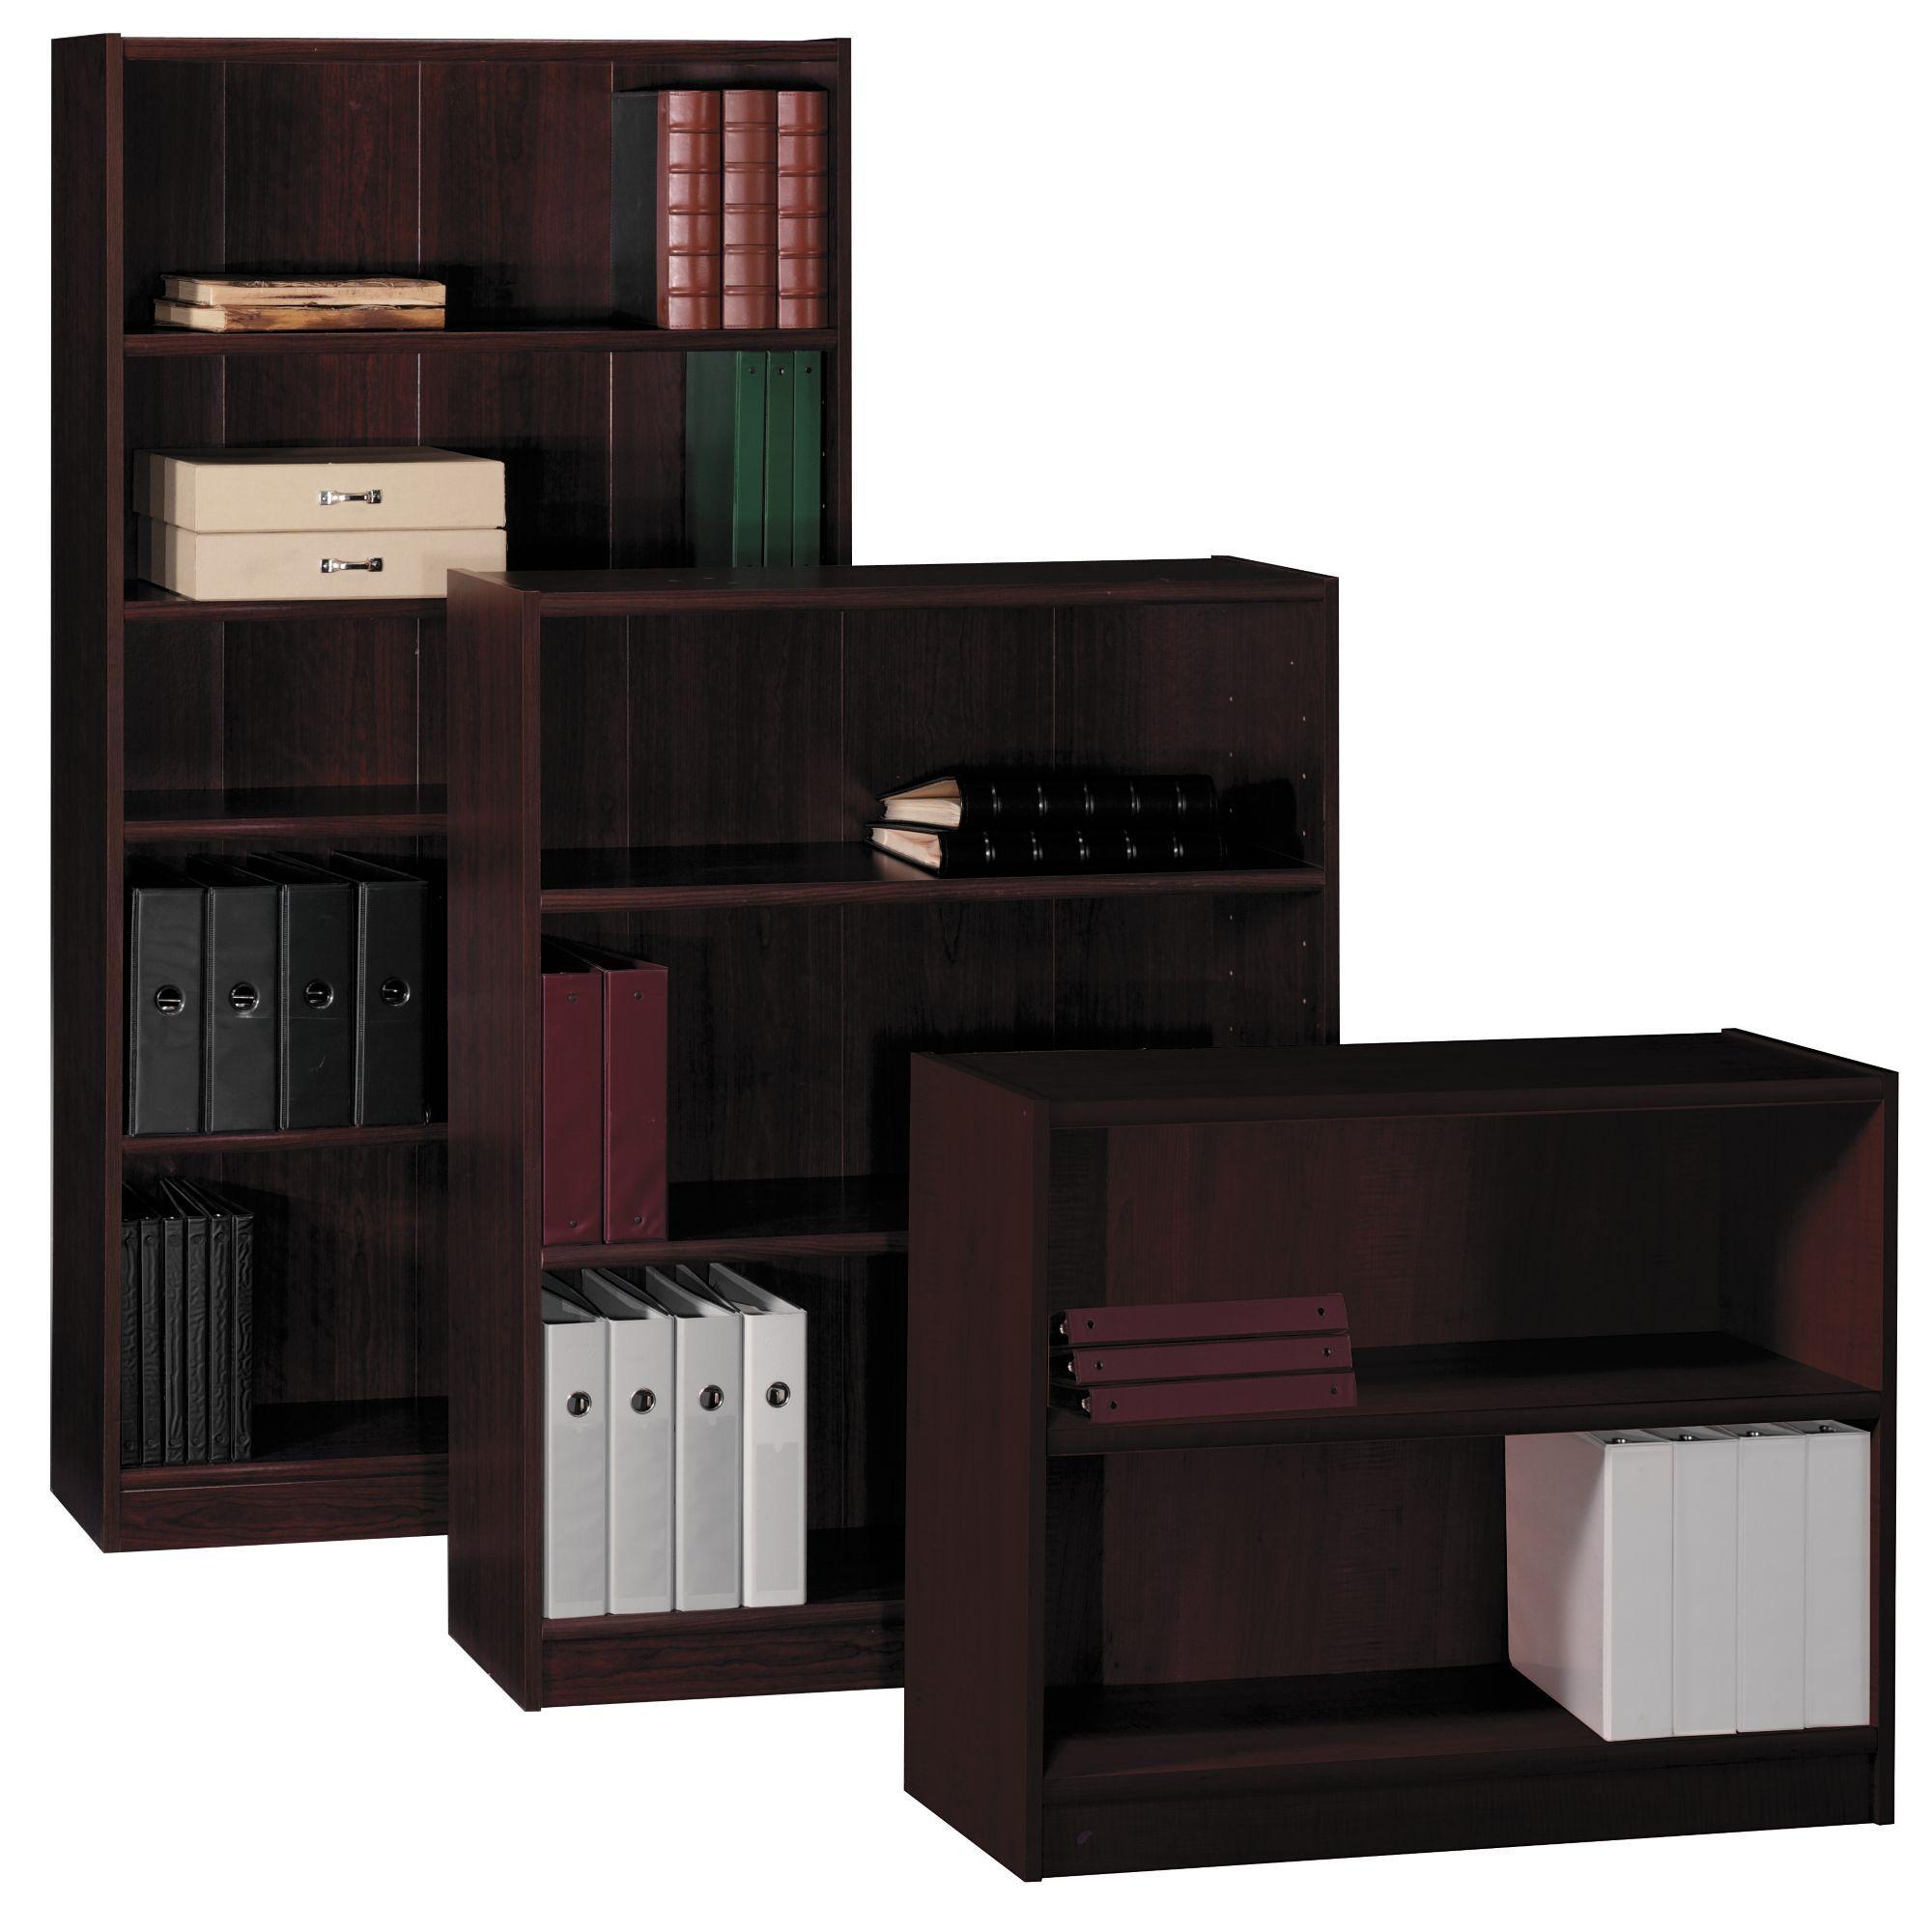 Universal 30 Inch Two Shelf Bookcase Kitchen